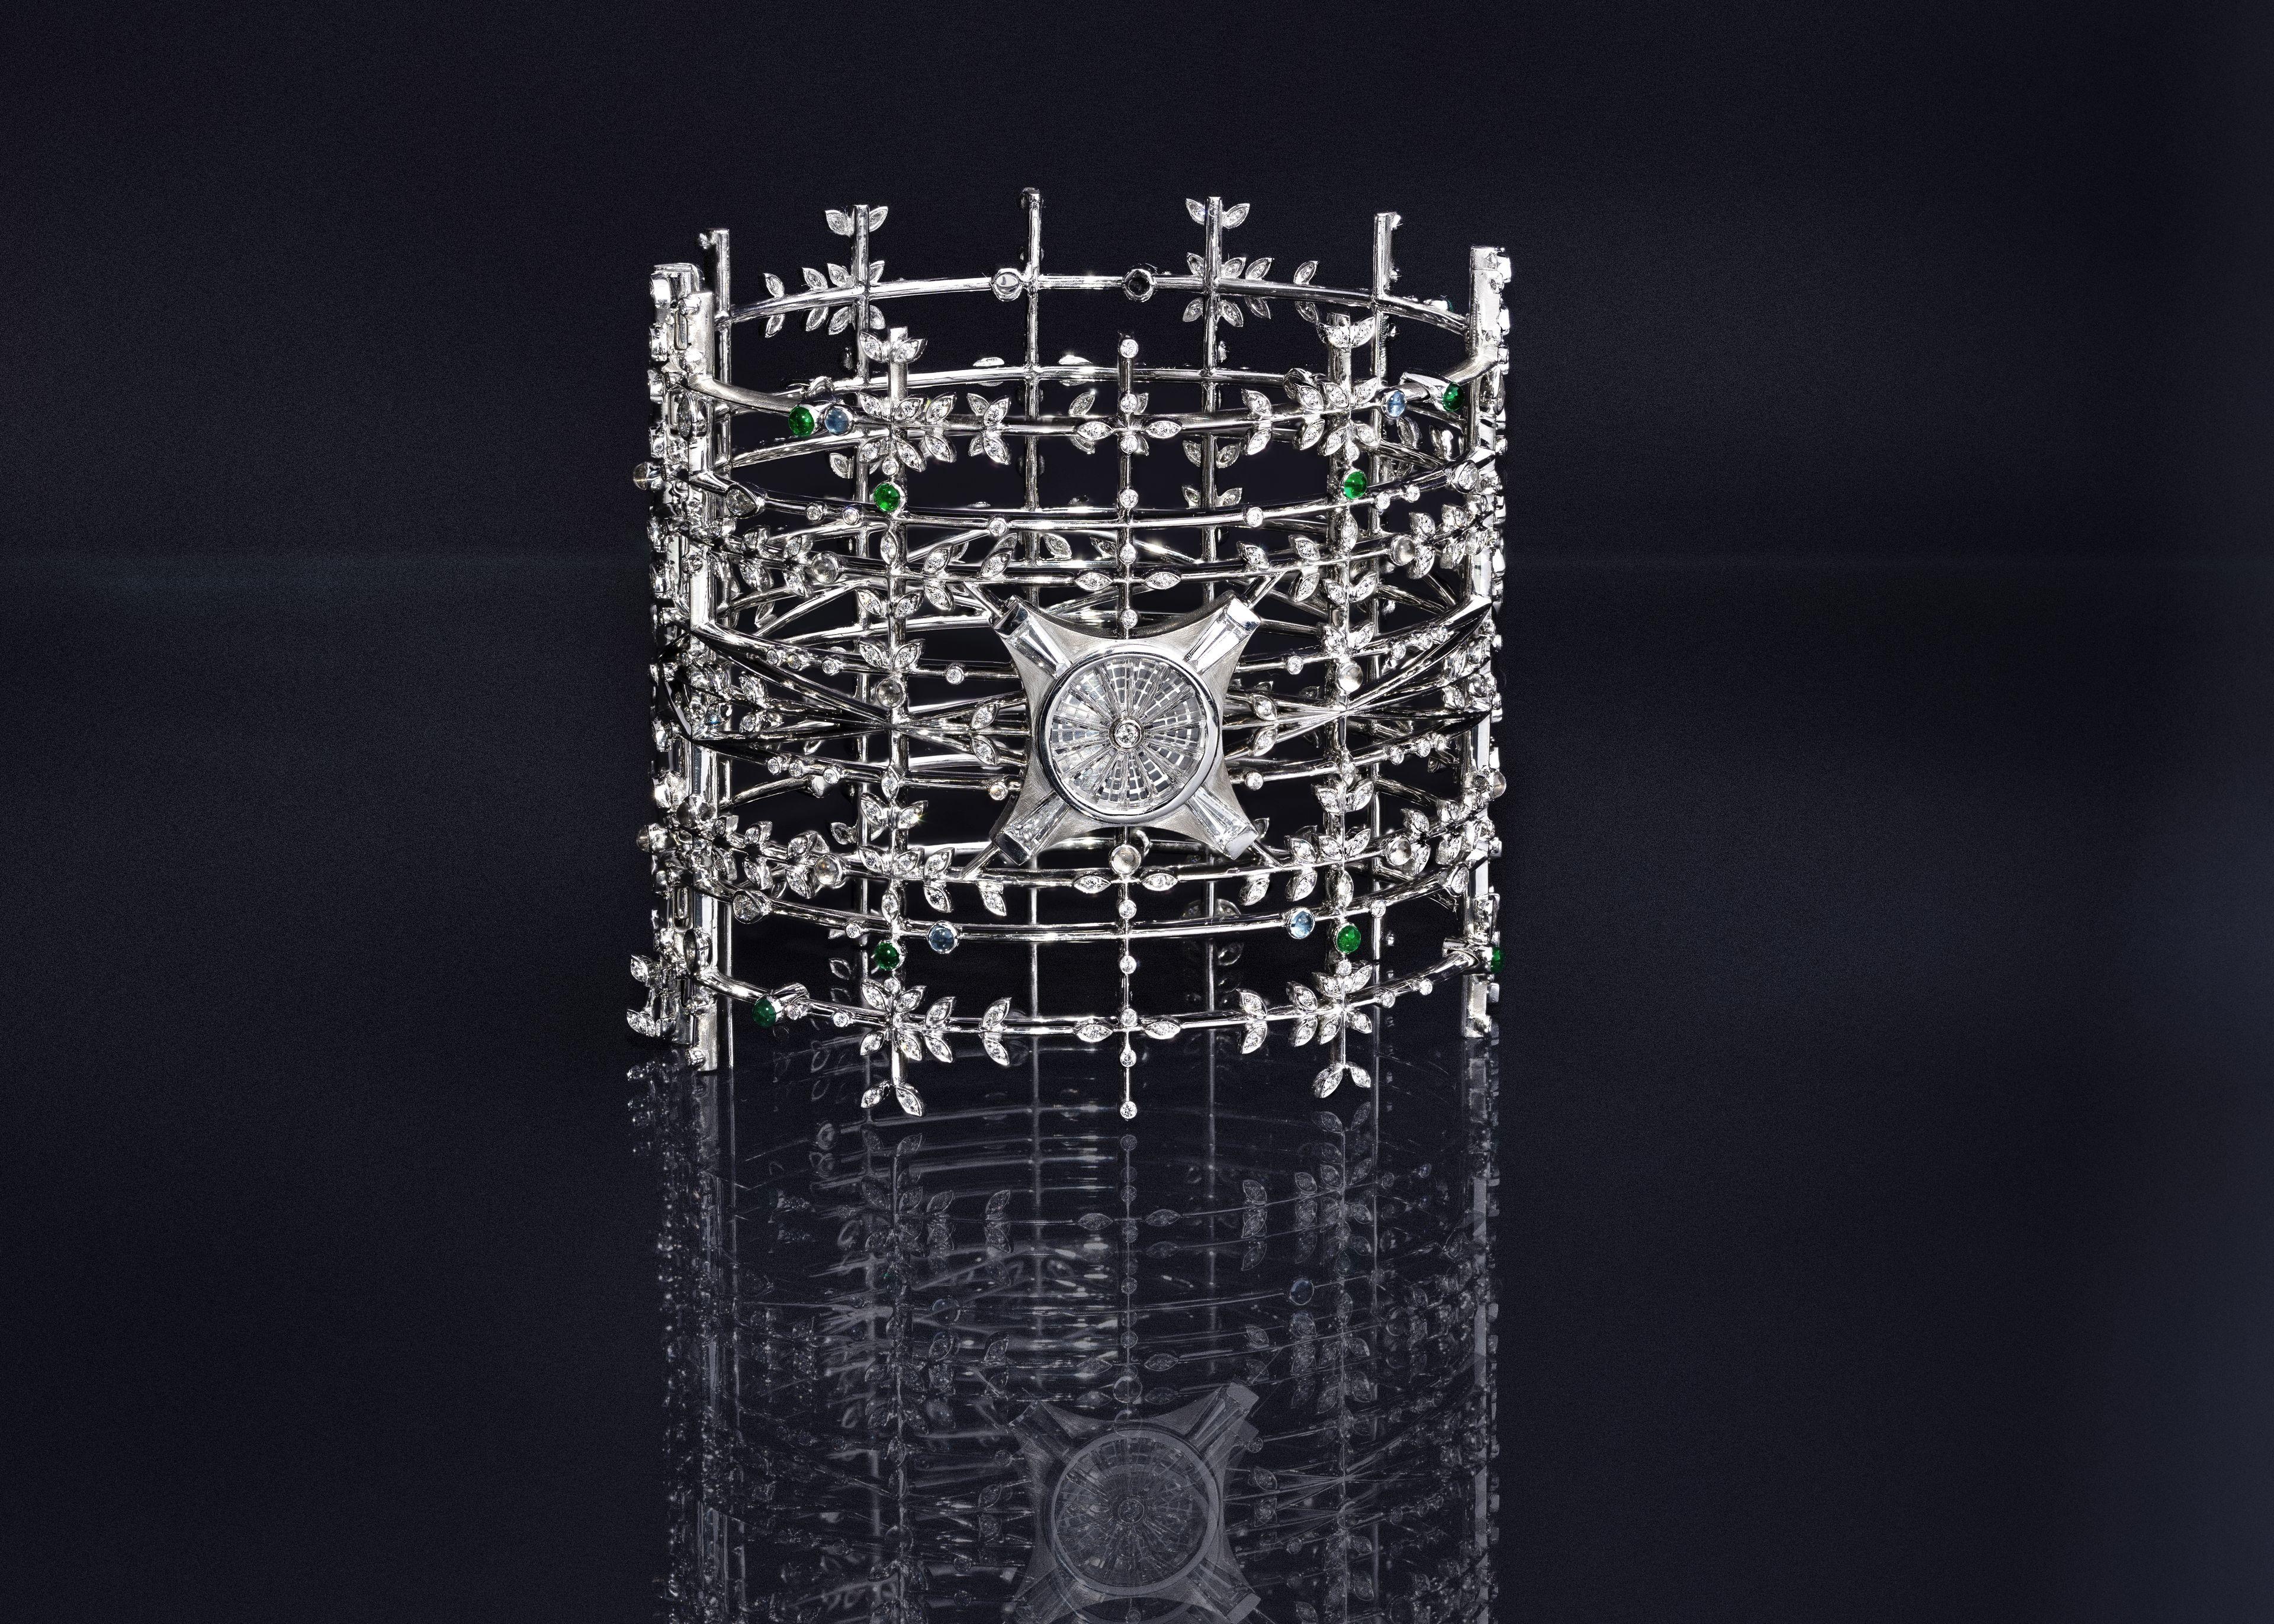 The Nave Cuff - White Gold, Diamonds, Rock Crystal, Emeralds & Aquamarine cabochons - Irène - Paris - le Grand Palais - High Jewellery - Architecture - Scenography